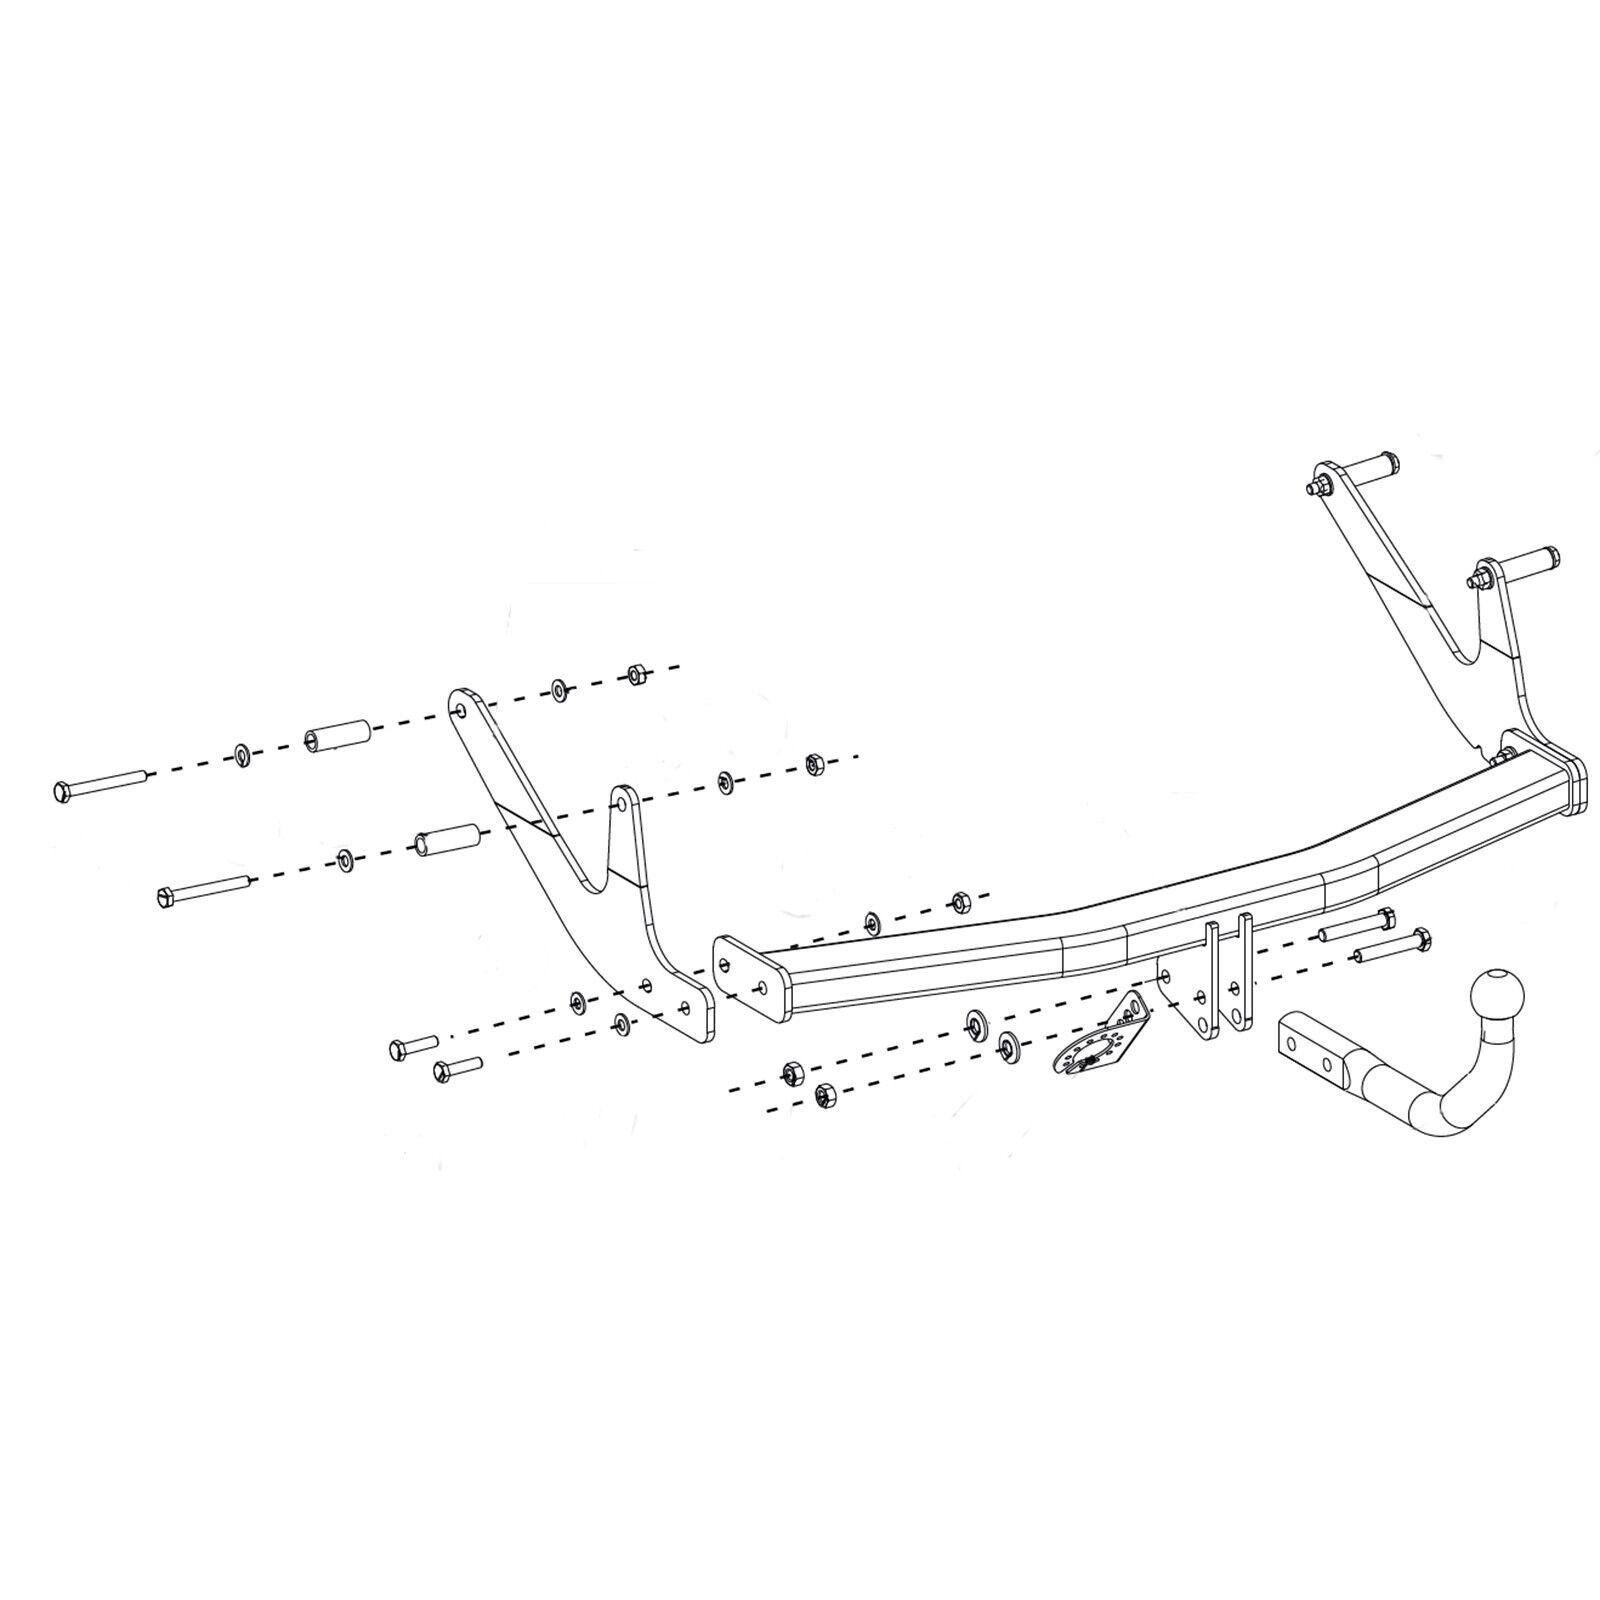 Oris Towbar For Dacia Logan Mcv Estate Onwards